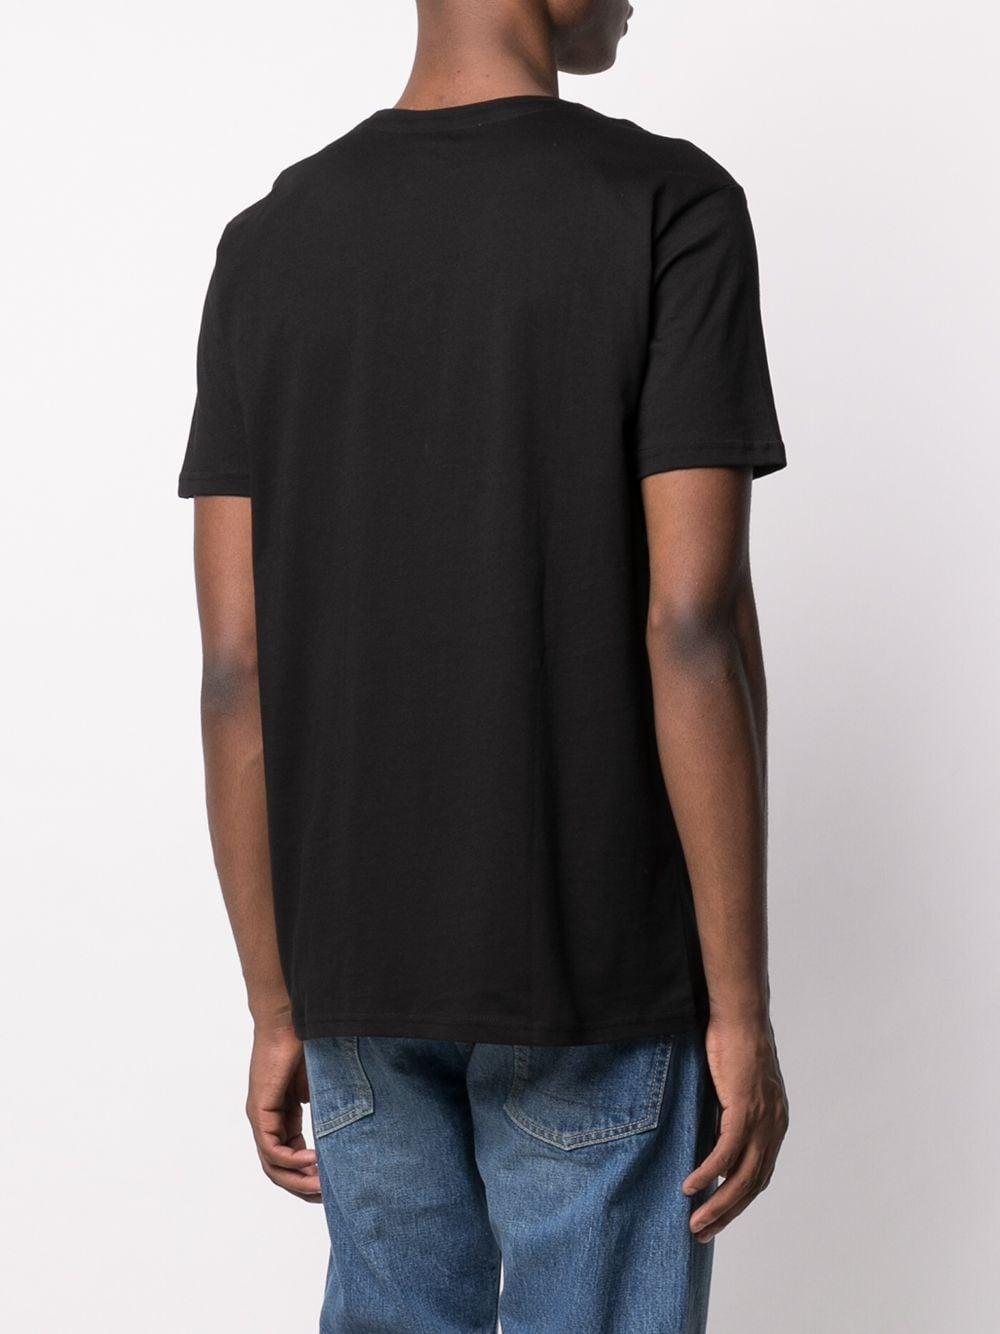 Alpha Industries nasa rainbow reflective t-shirt uomo ALPHA INDUSTRIES | T-shirt | 178501RR03